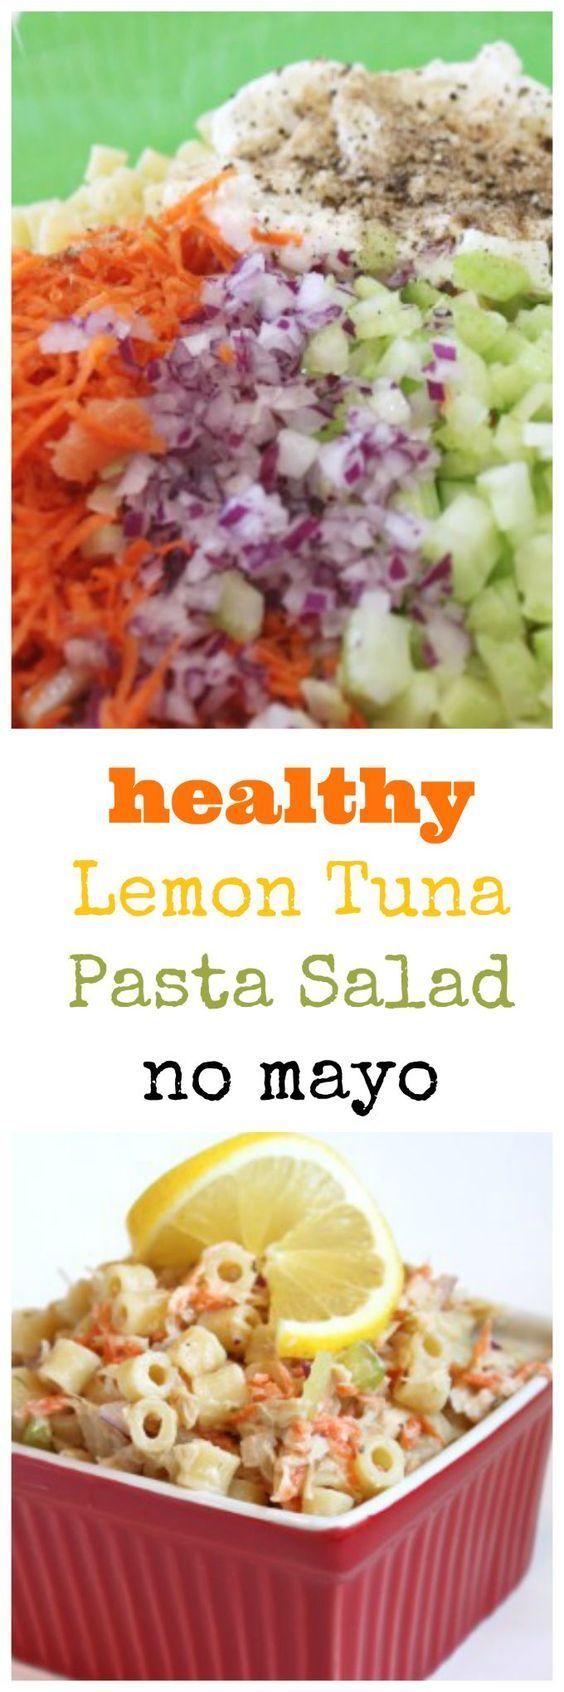 healthy lemon tuna pasta salad with no mayo @createdbydiane